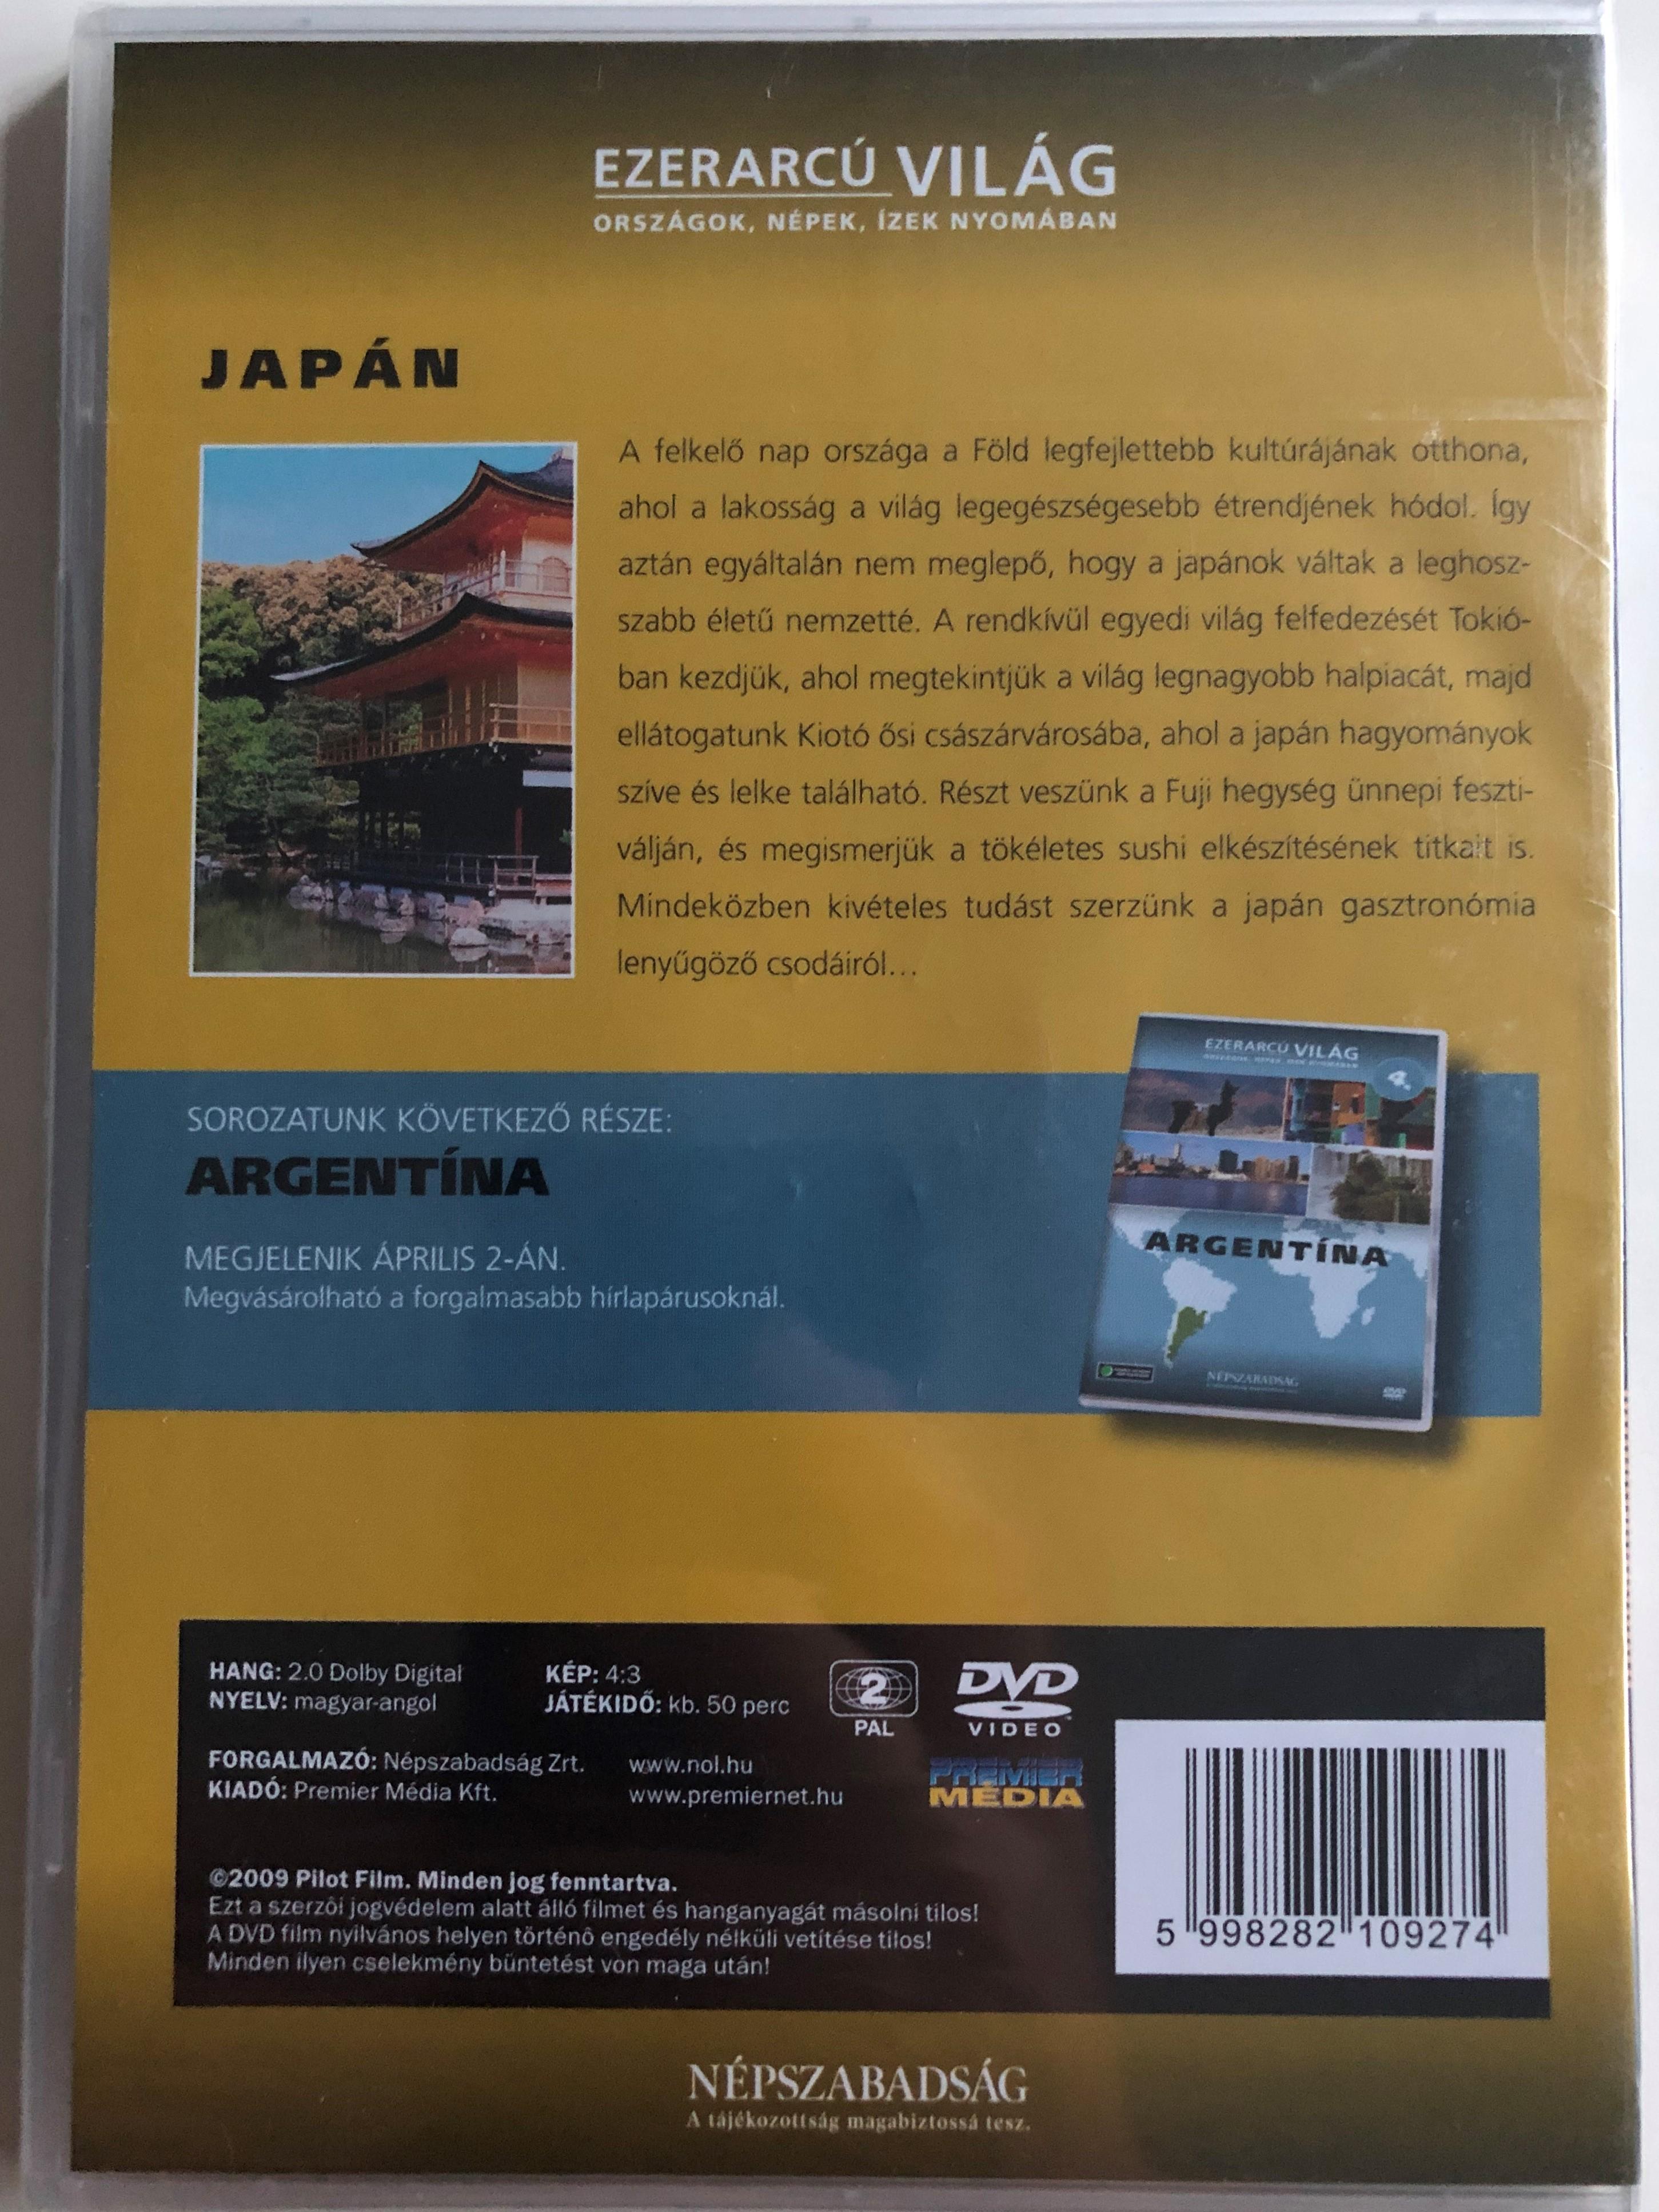 ezerarc-vil-g-vol.-3-jap-n-japan-dvd-2009-orsz-gok-n-pek-zek-nyom-ban-20-x-dvd-set-2009-n-pszabads-g-premier-media-pilot-film-documentary-series-about-our-world-2-.jpg